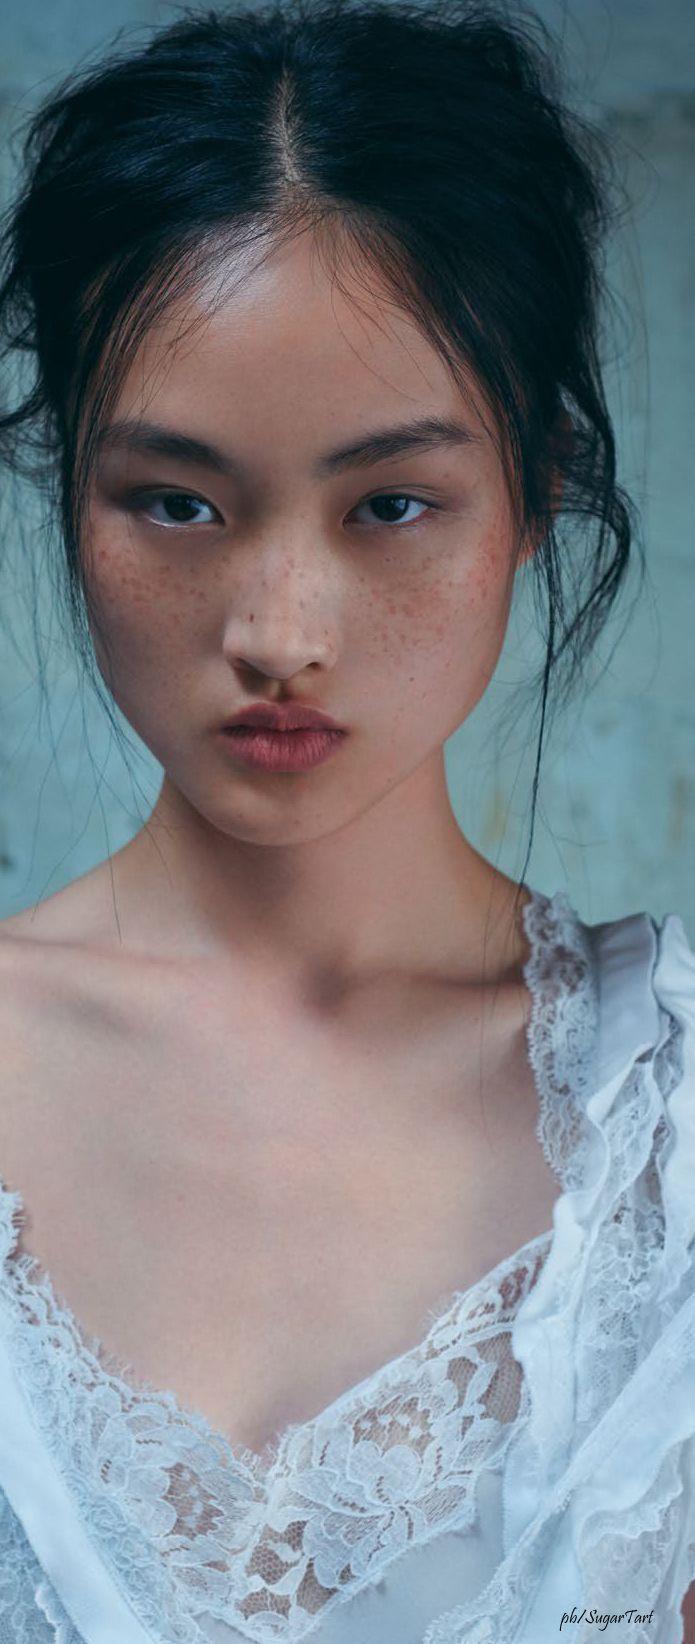 Portofolio Fotografi Potret - Jing Wen by Stefan Khoo Mollylucille  #MODELPHOTOGRAPHY, #POTRAITPHOTOGRAPHY